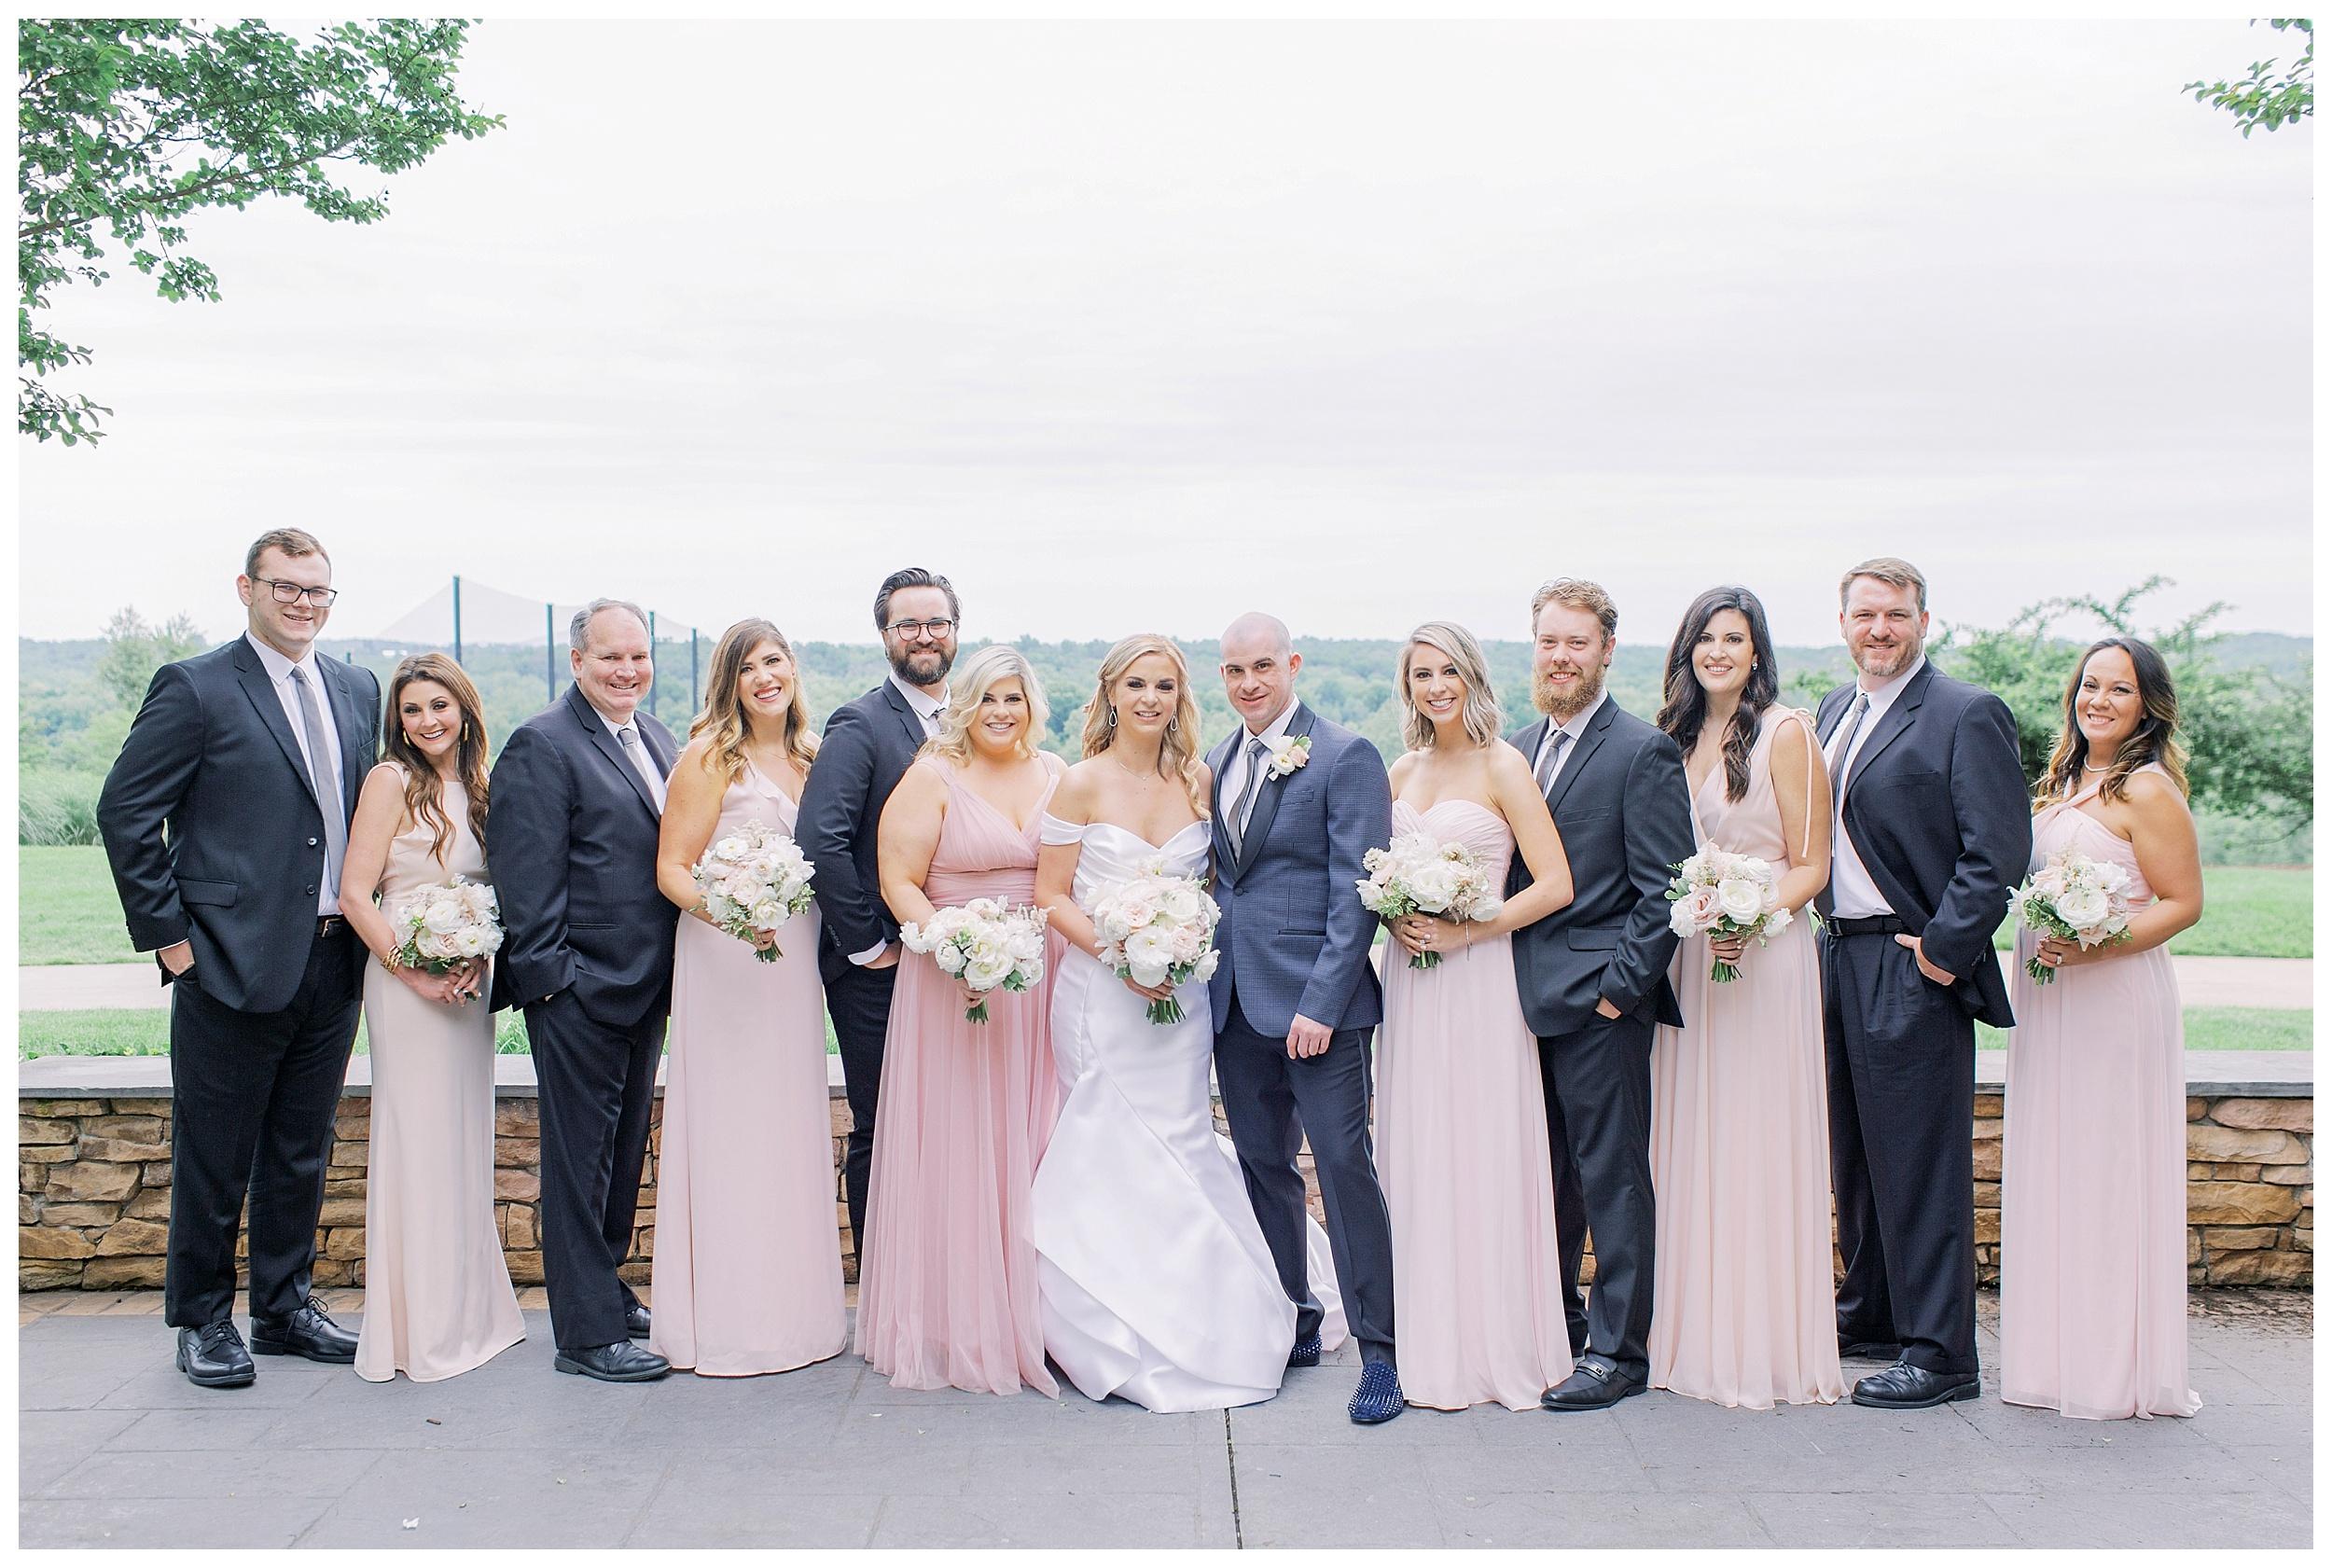 Lansdowne Resort Wedding | Virginia Film Wedding Photographer Kir Tuben_0051.jpg